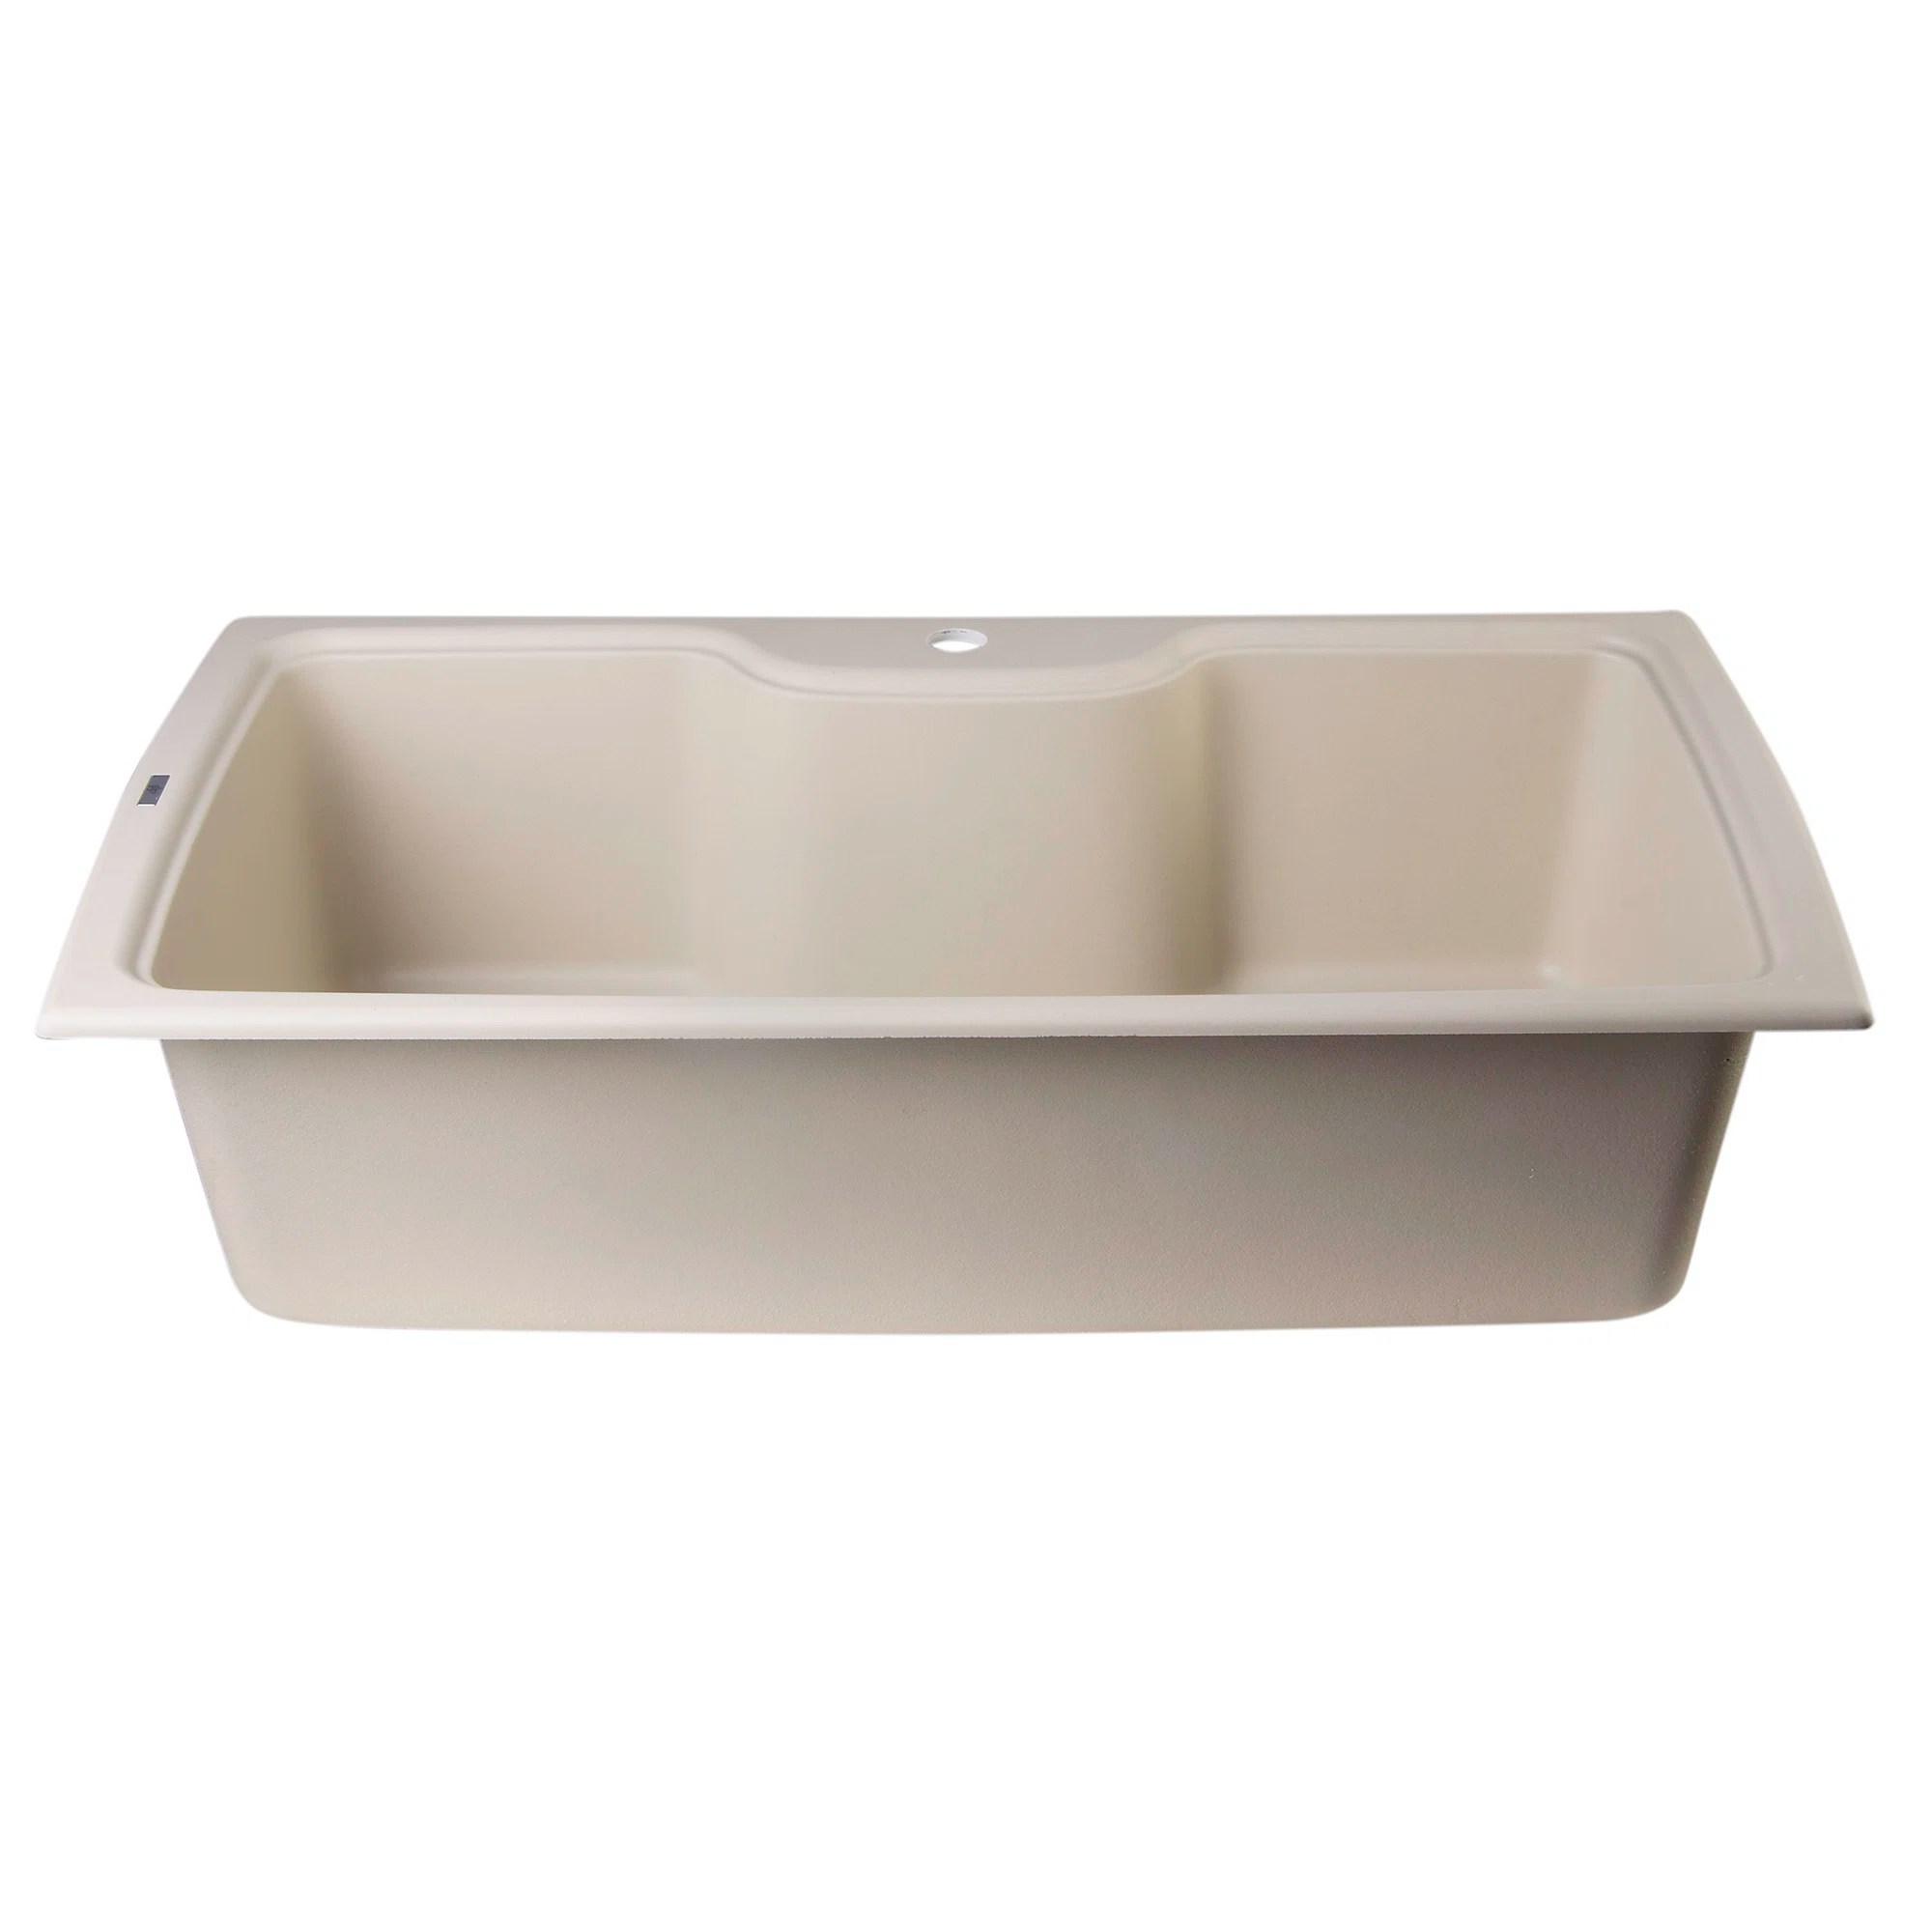 single bowl kitchen sinks murphy table alfi brand 34 63 quot x 19 69 drop in